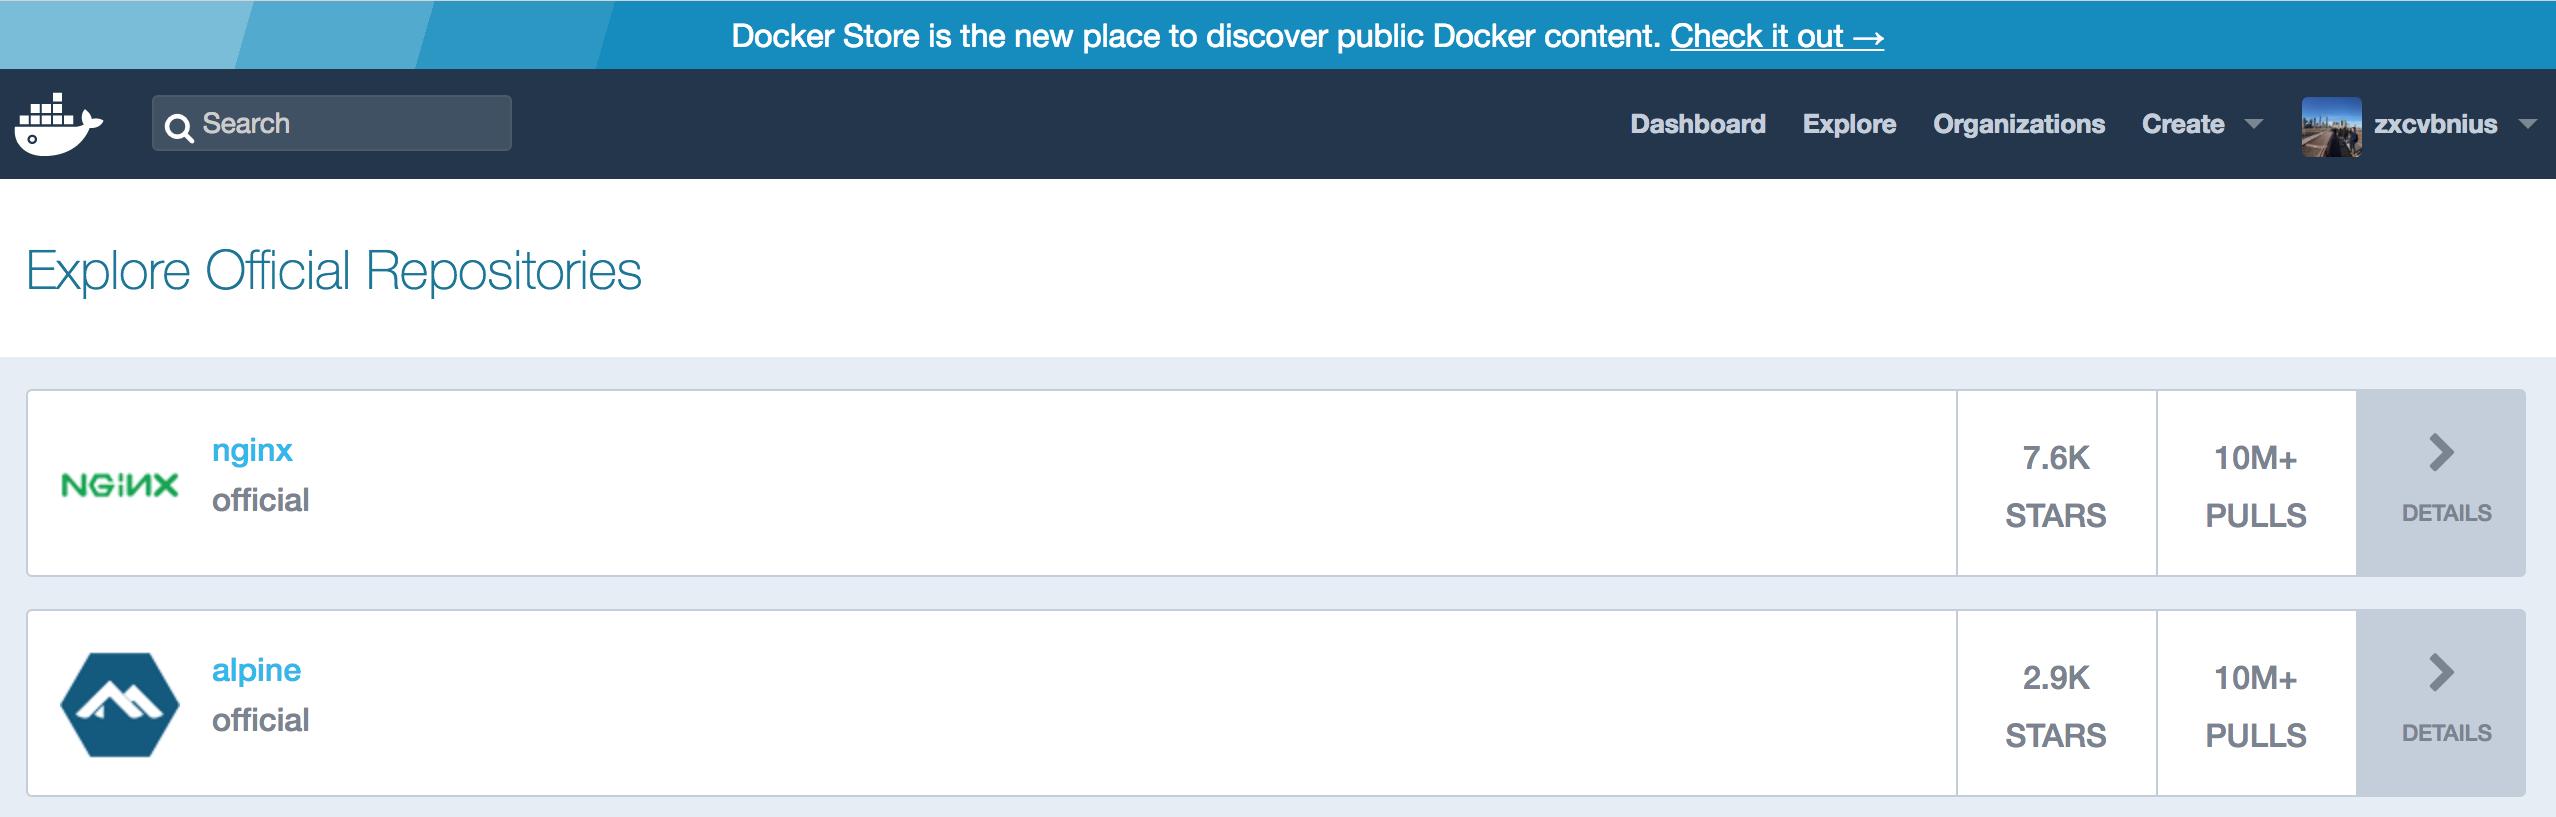 docker-hub-explore